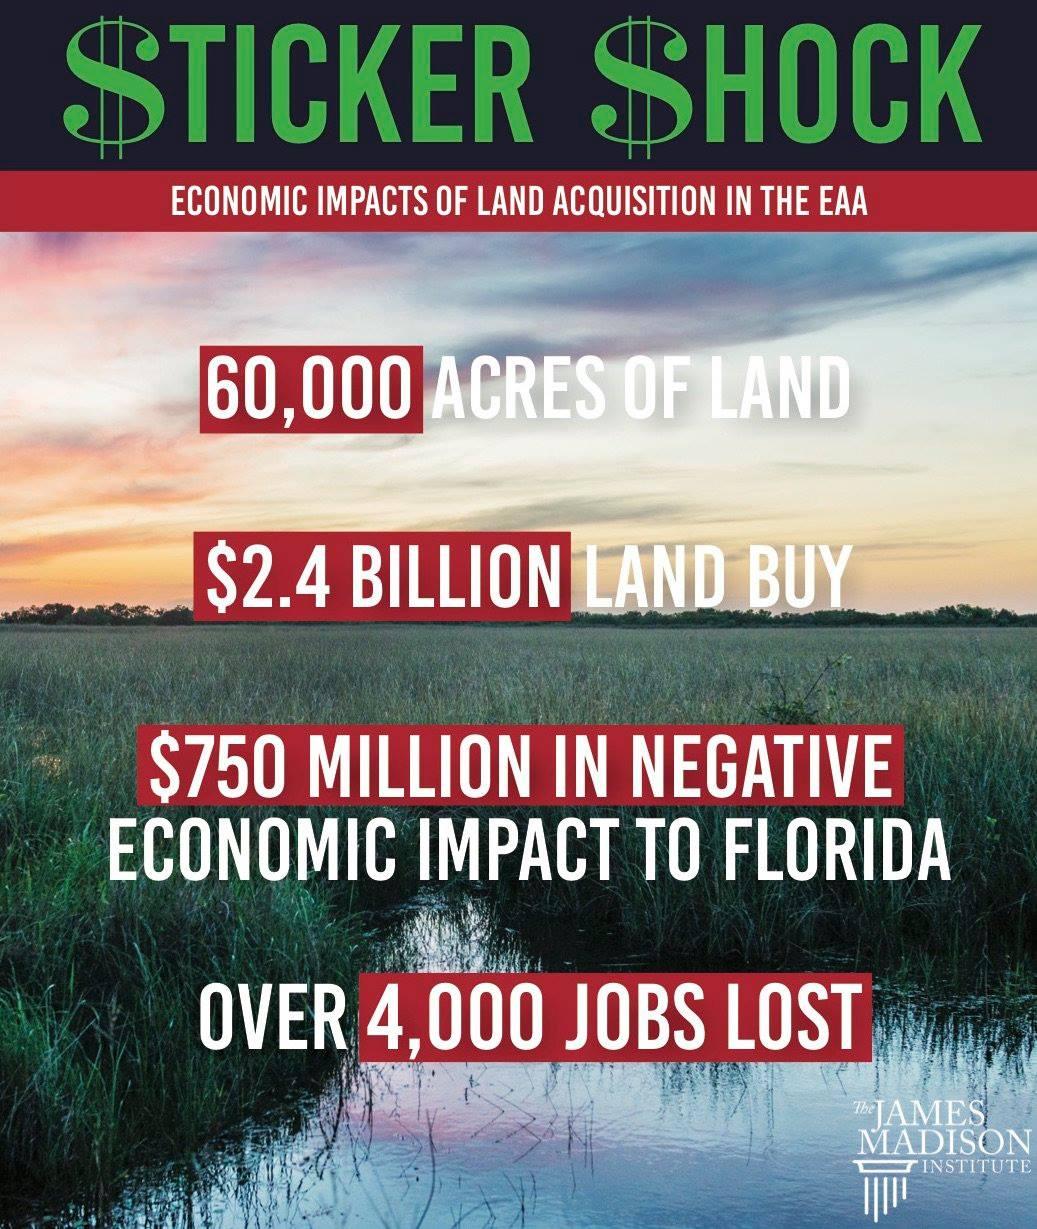 Negative Economic Impact of EAA Land Acquisition